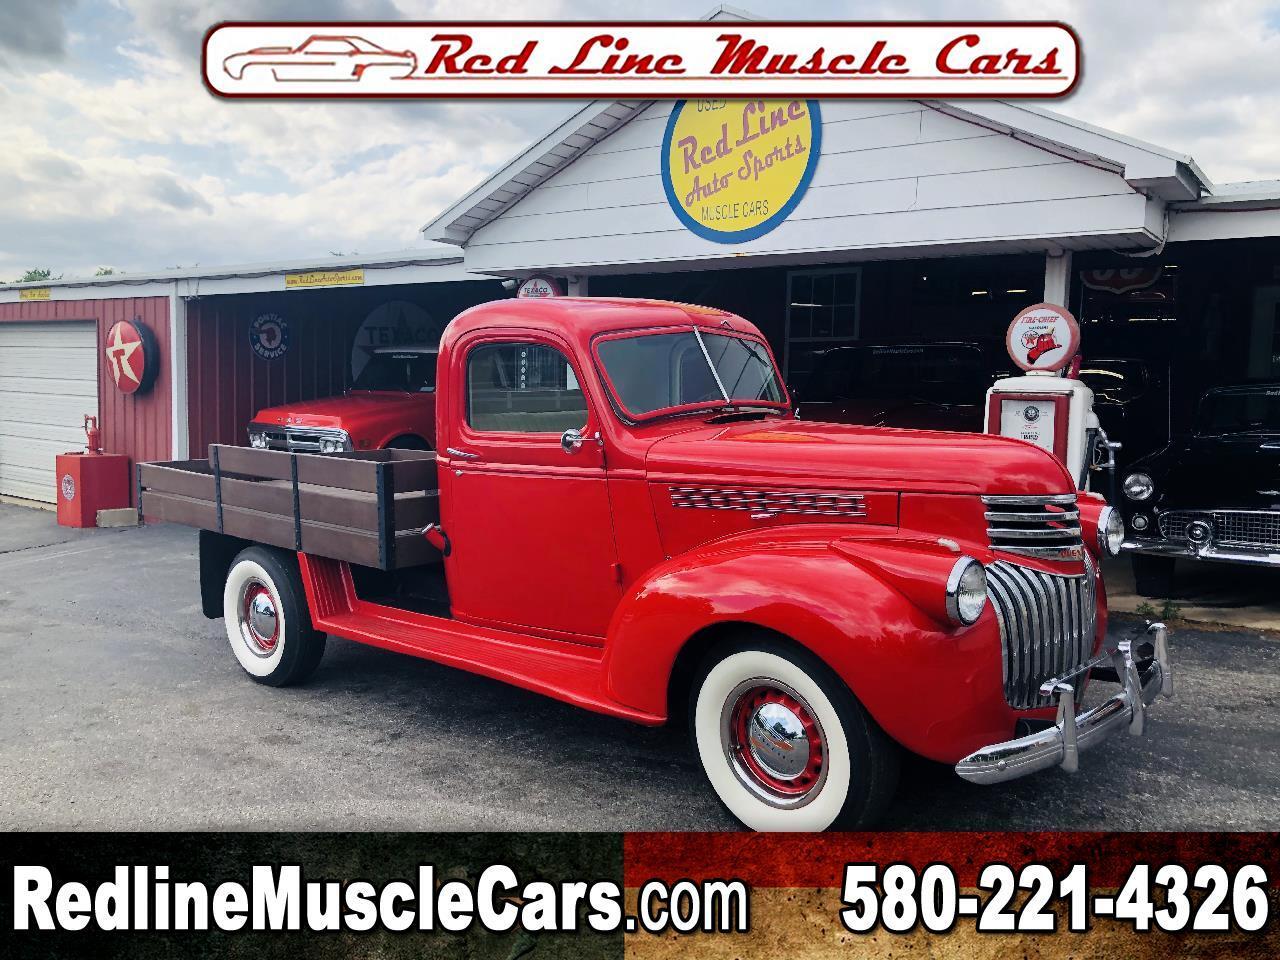 1942 Chevrolet 1/2 Ton Pickups truck